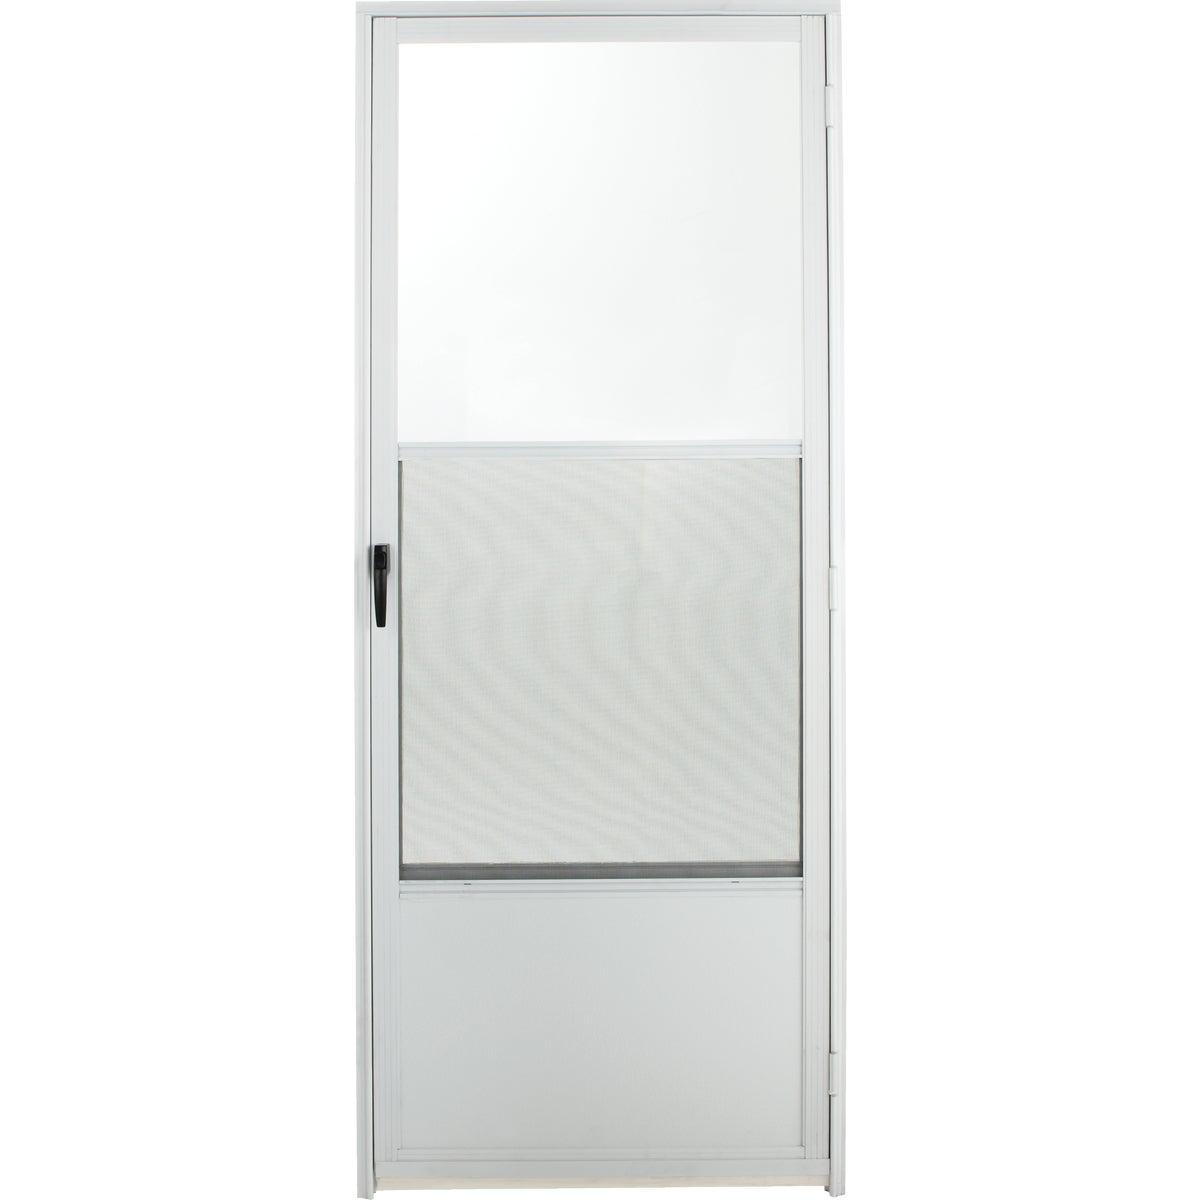 163 2868 RH WHT DOOR - F05774 by Croft Llc